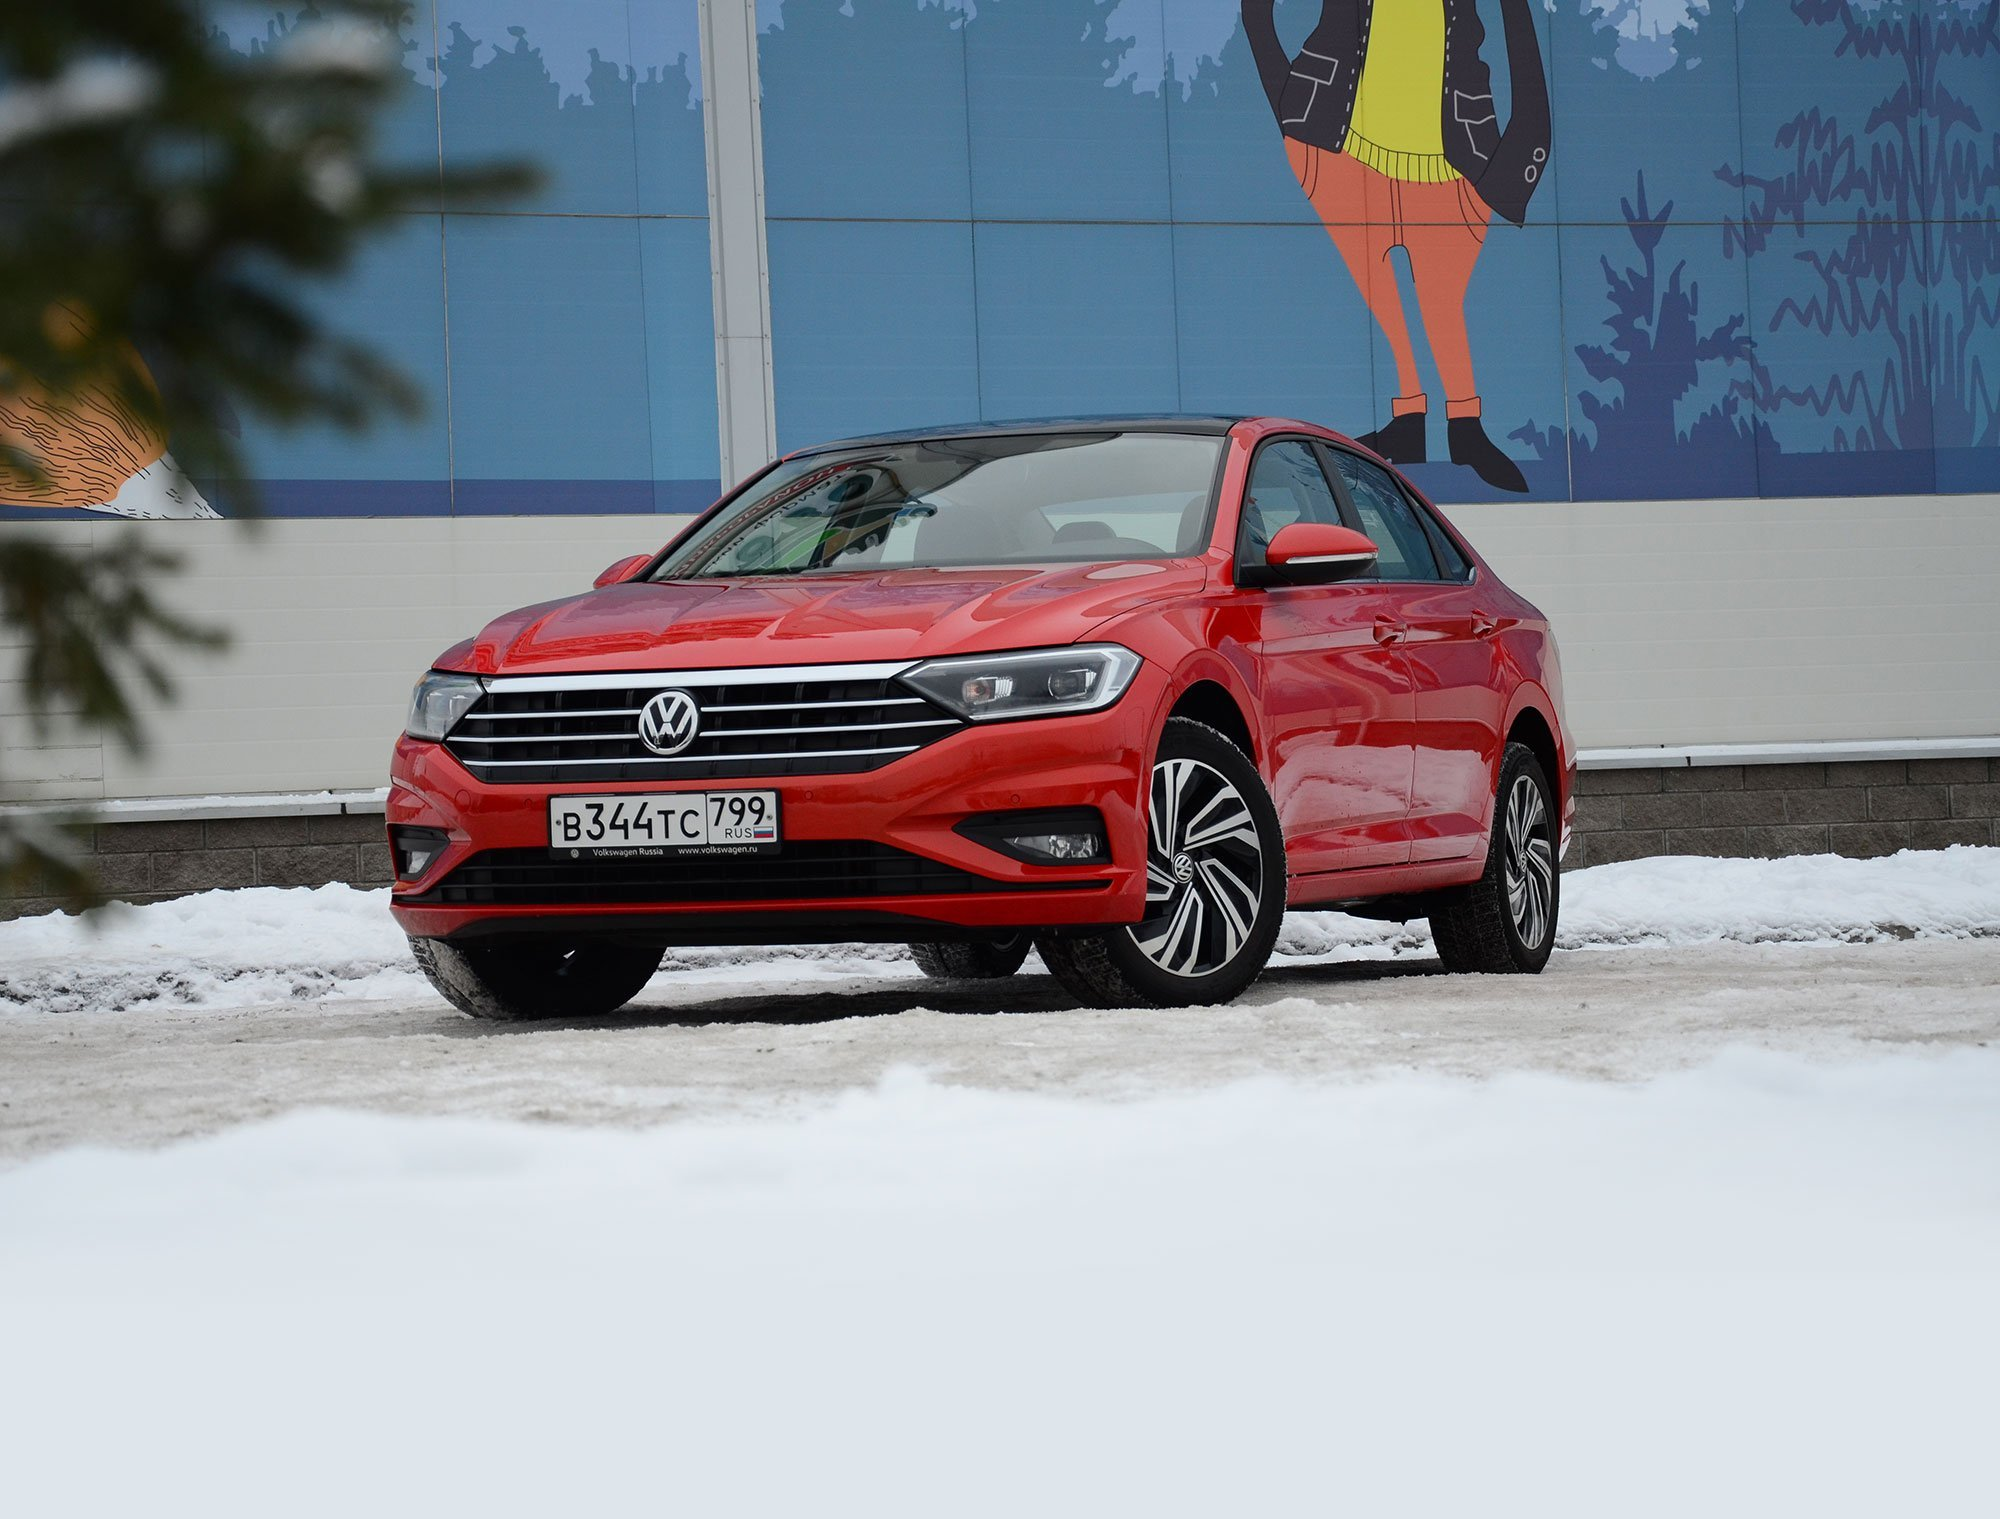 Взял новый VW Jetta и через два месяца вернул: считаю затраты